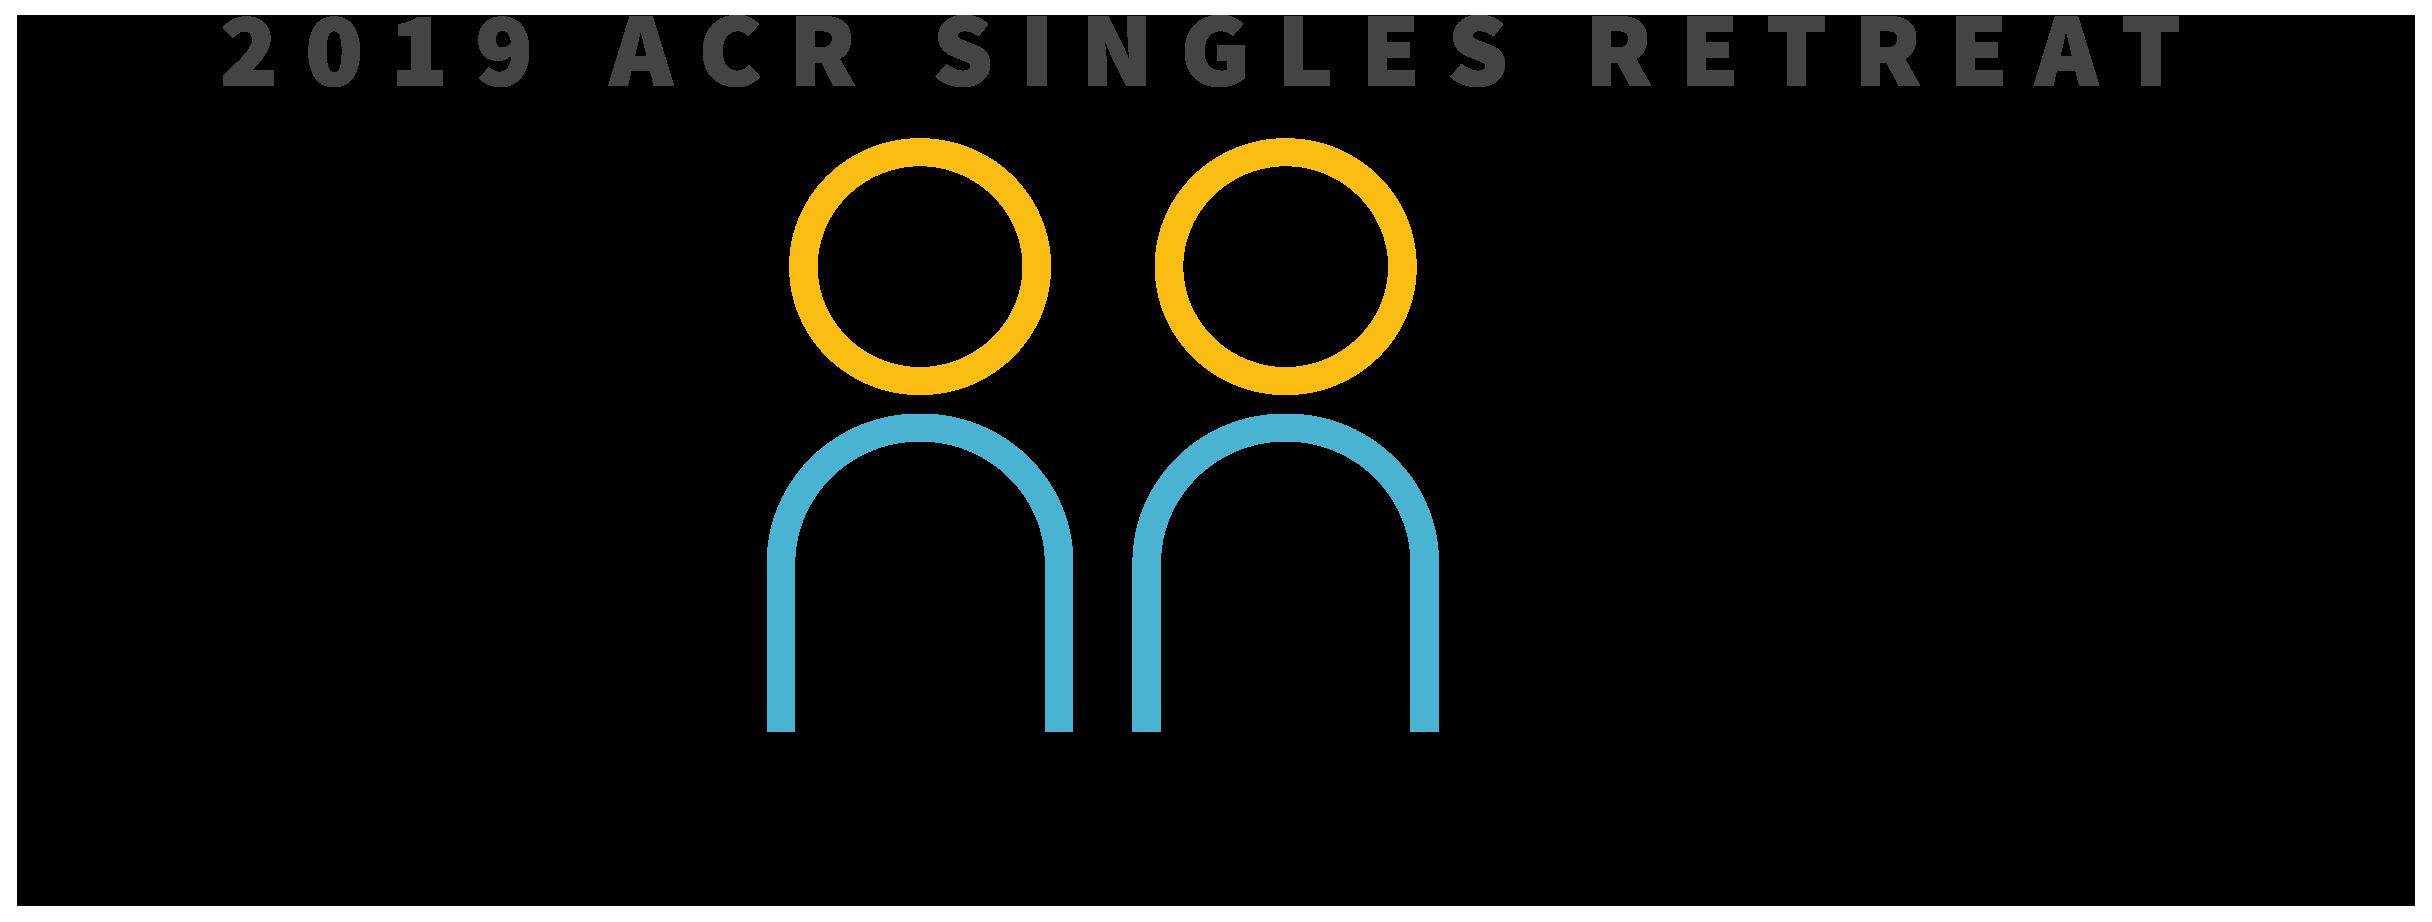 2019 ACR Singles Retreat logo